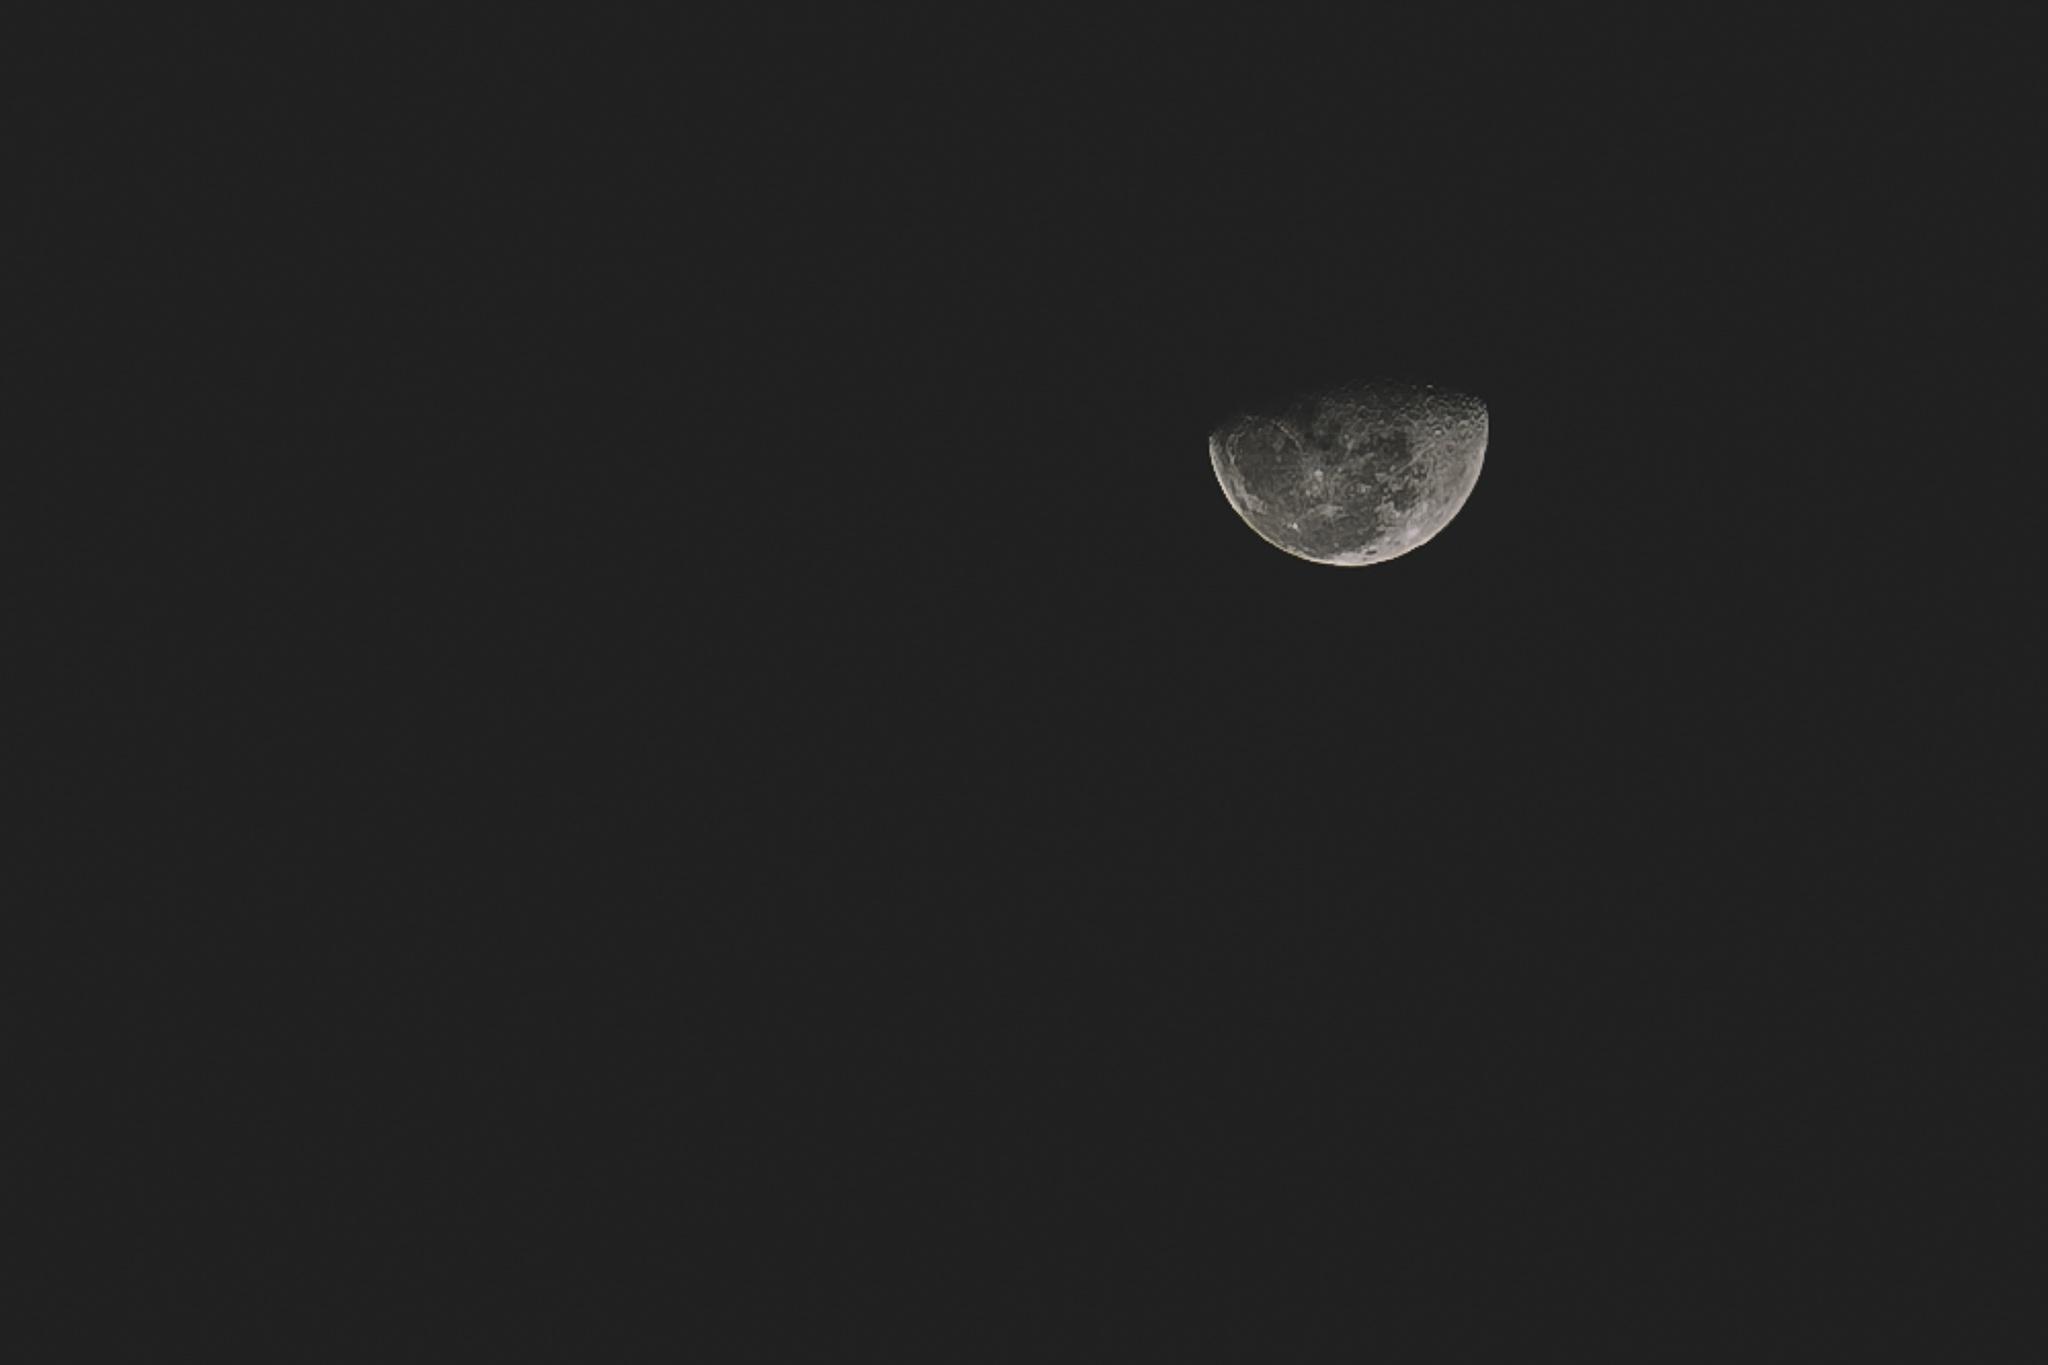 Moon by Davi Pieper